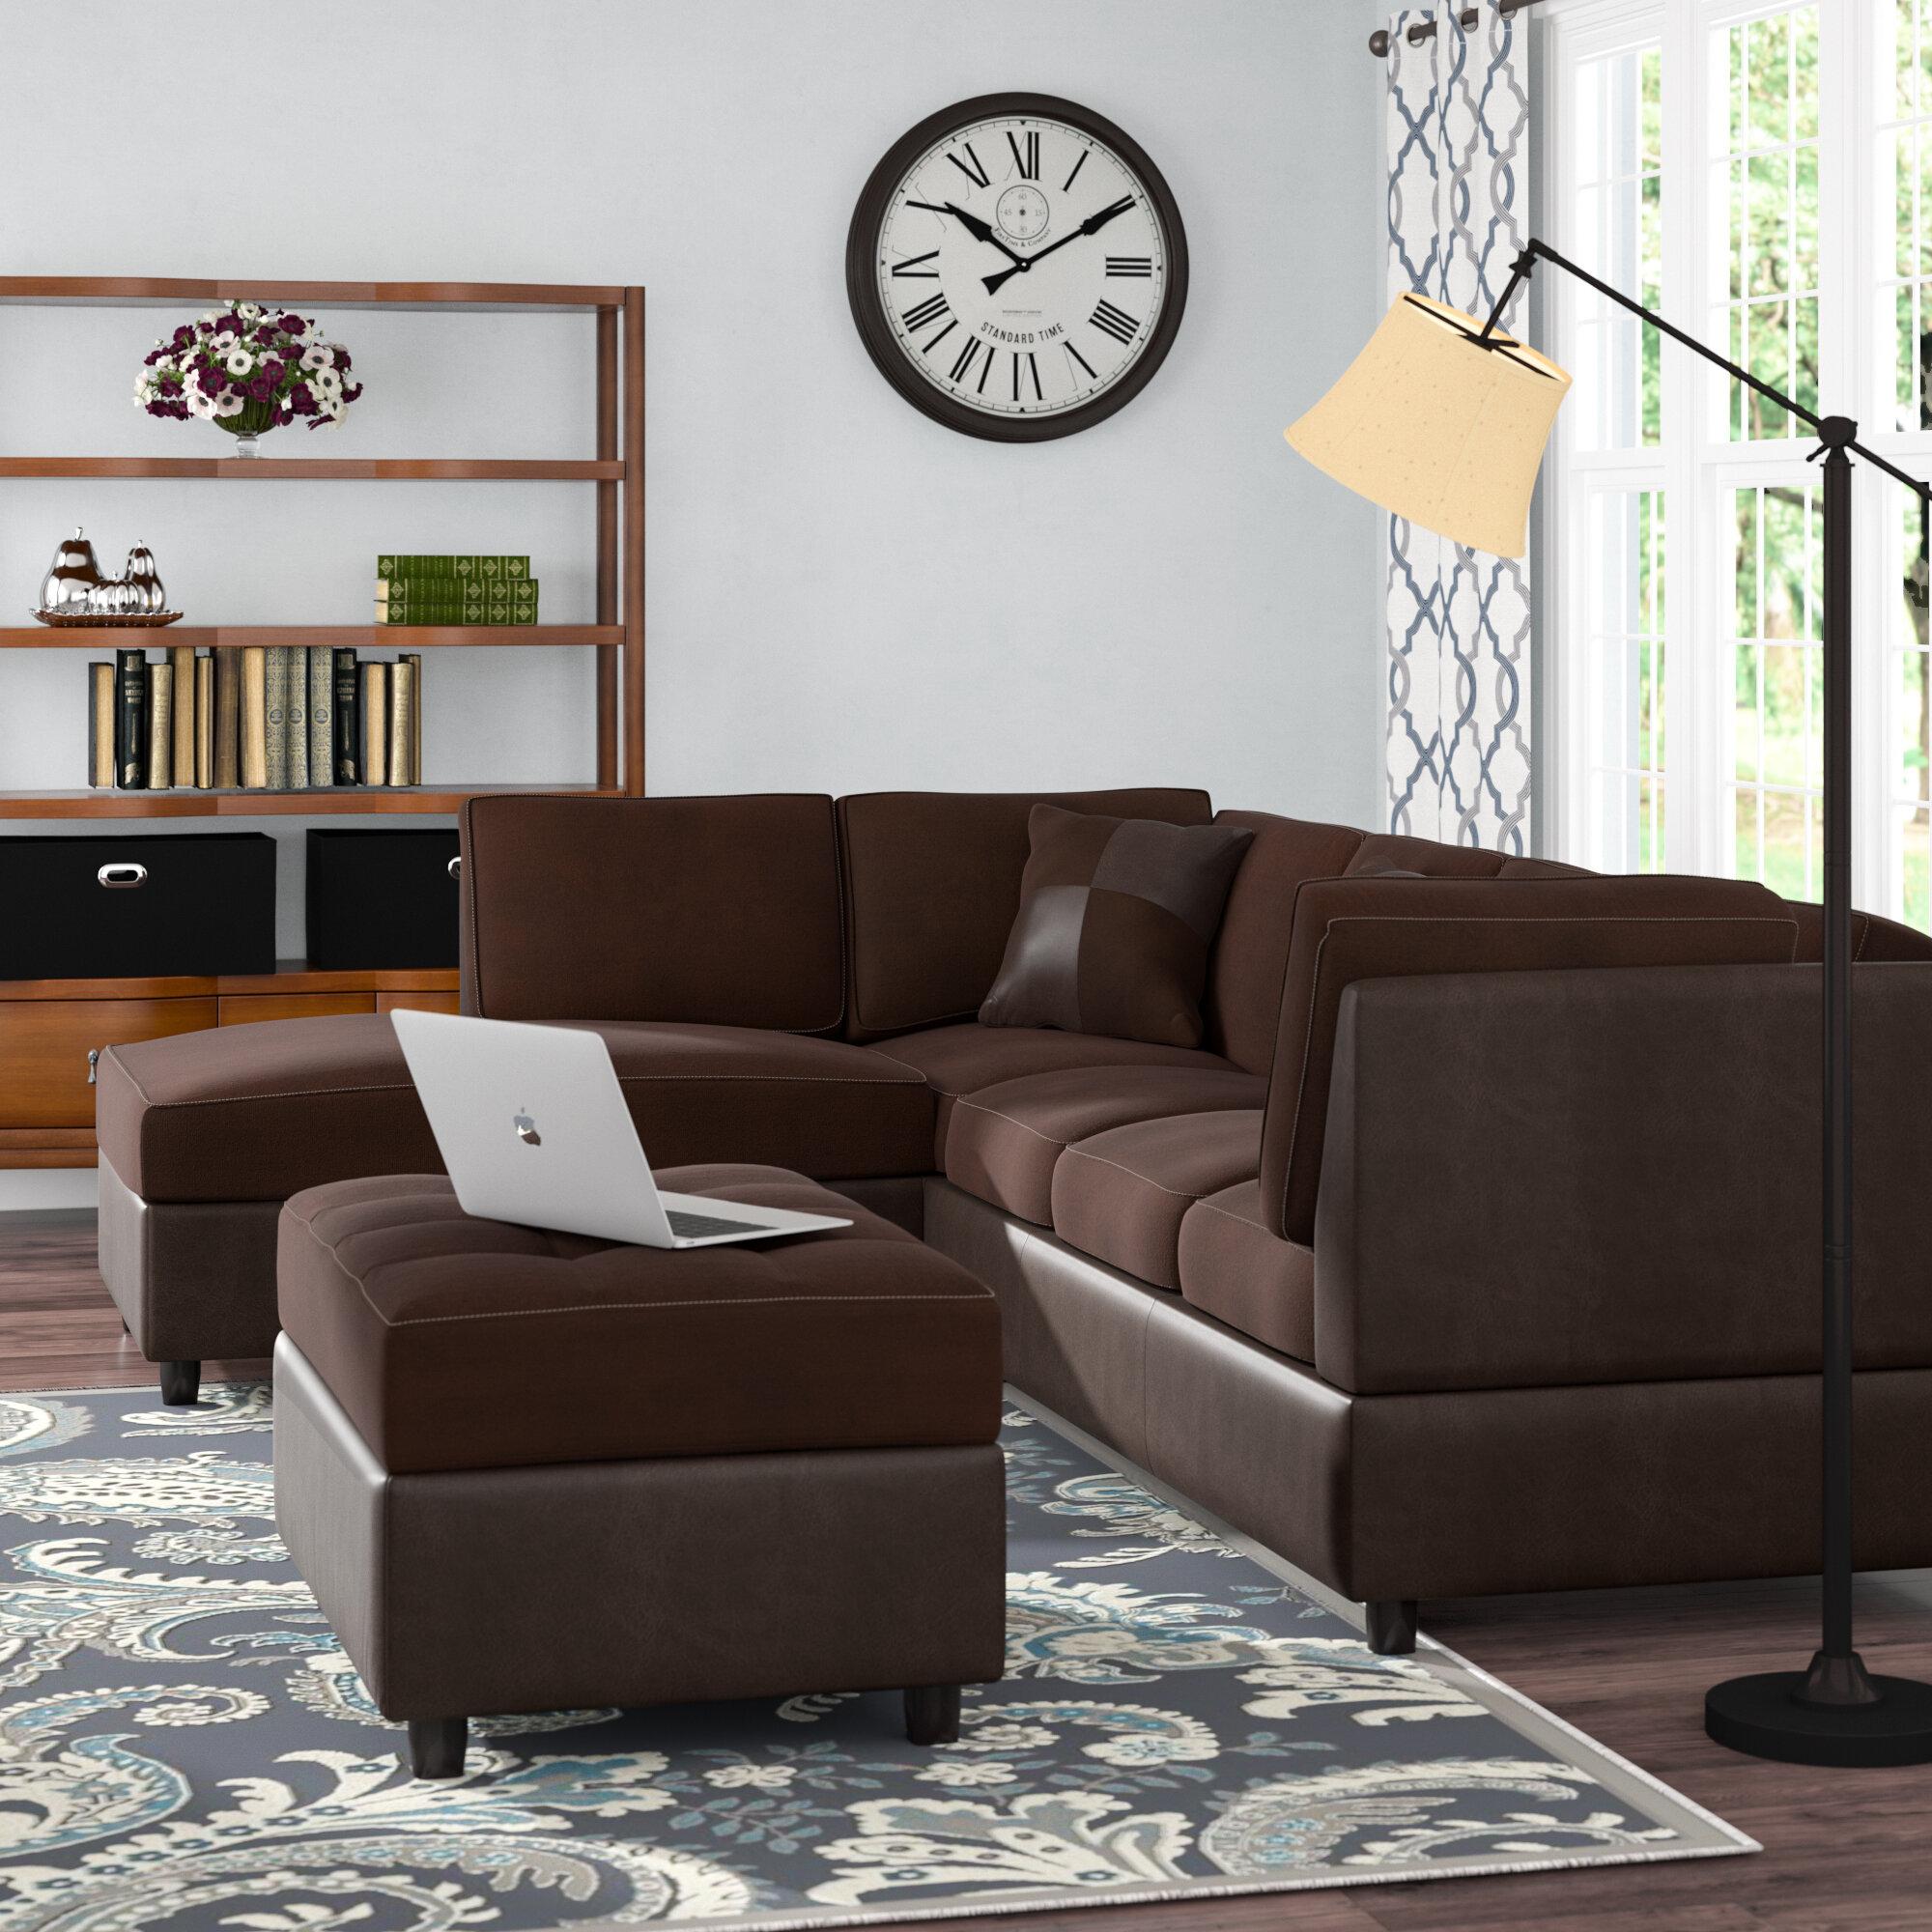 Magnificent Slim Leather Attache Cases Wayfair Unemploymentrelief Wooden Chair Designs For Living Room Unemploymentrelieforg